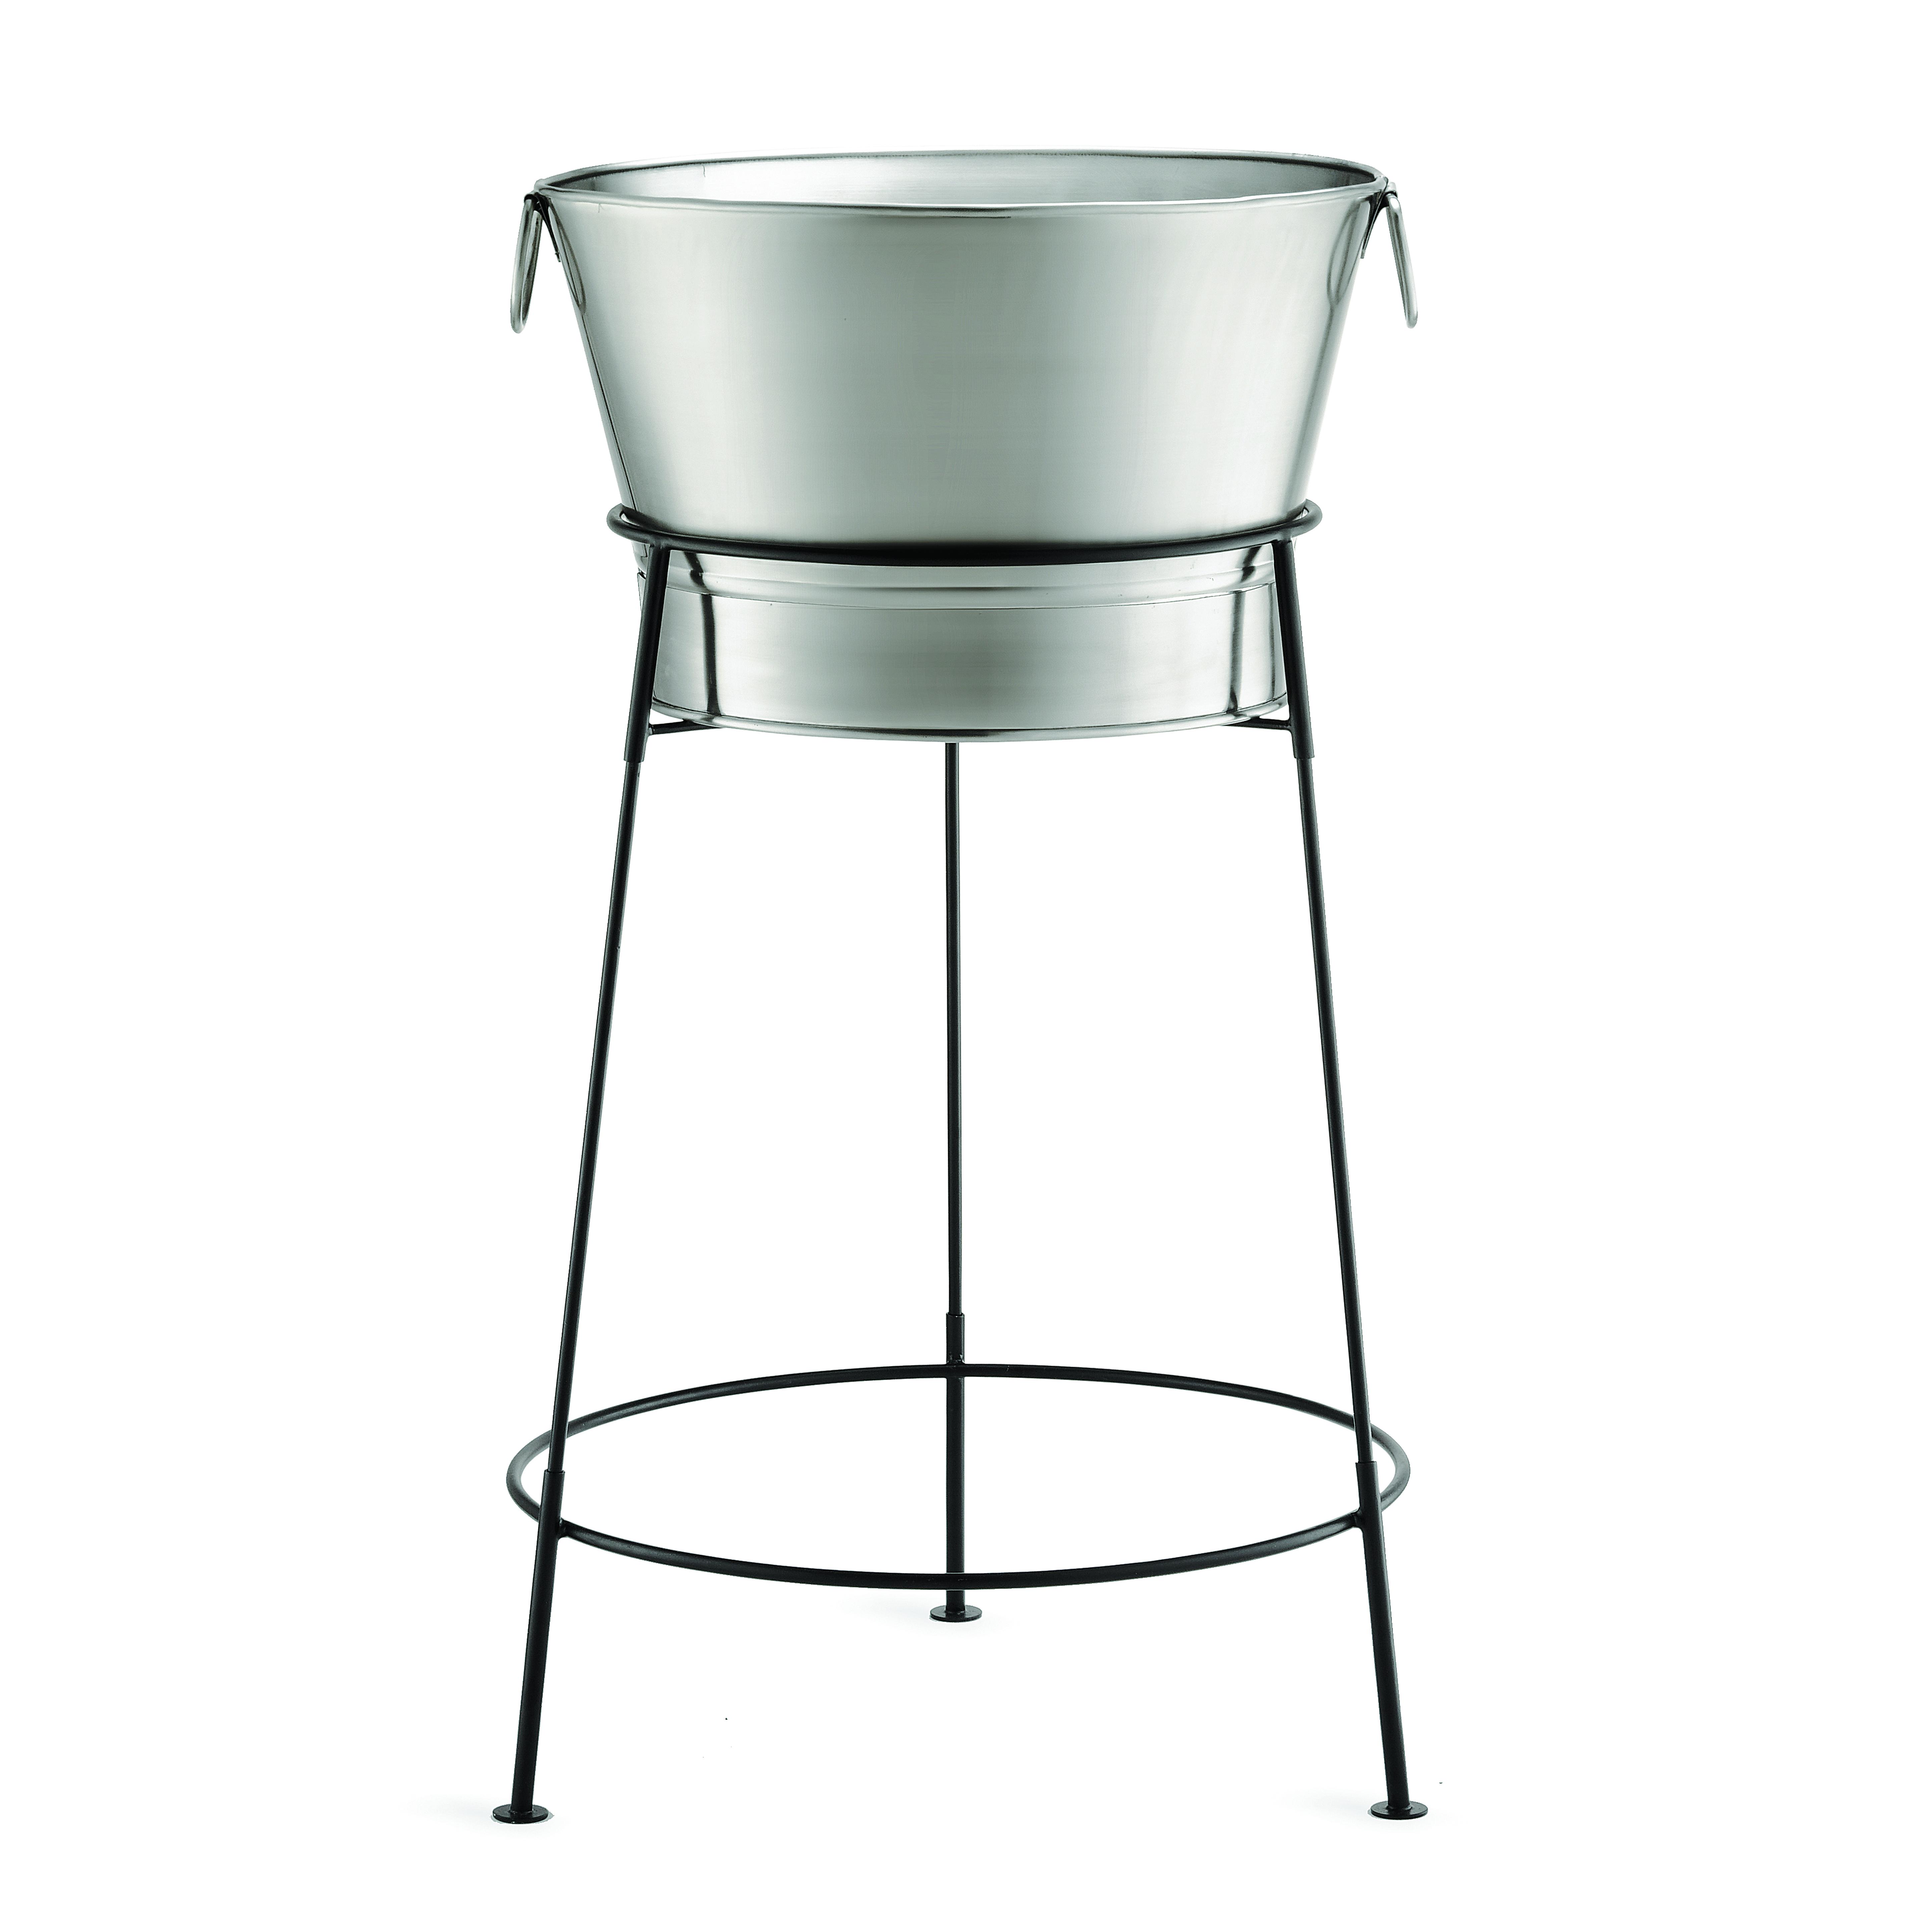 TableCraft Products BTSD21 beverage / ice tub